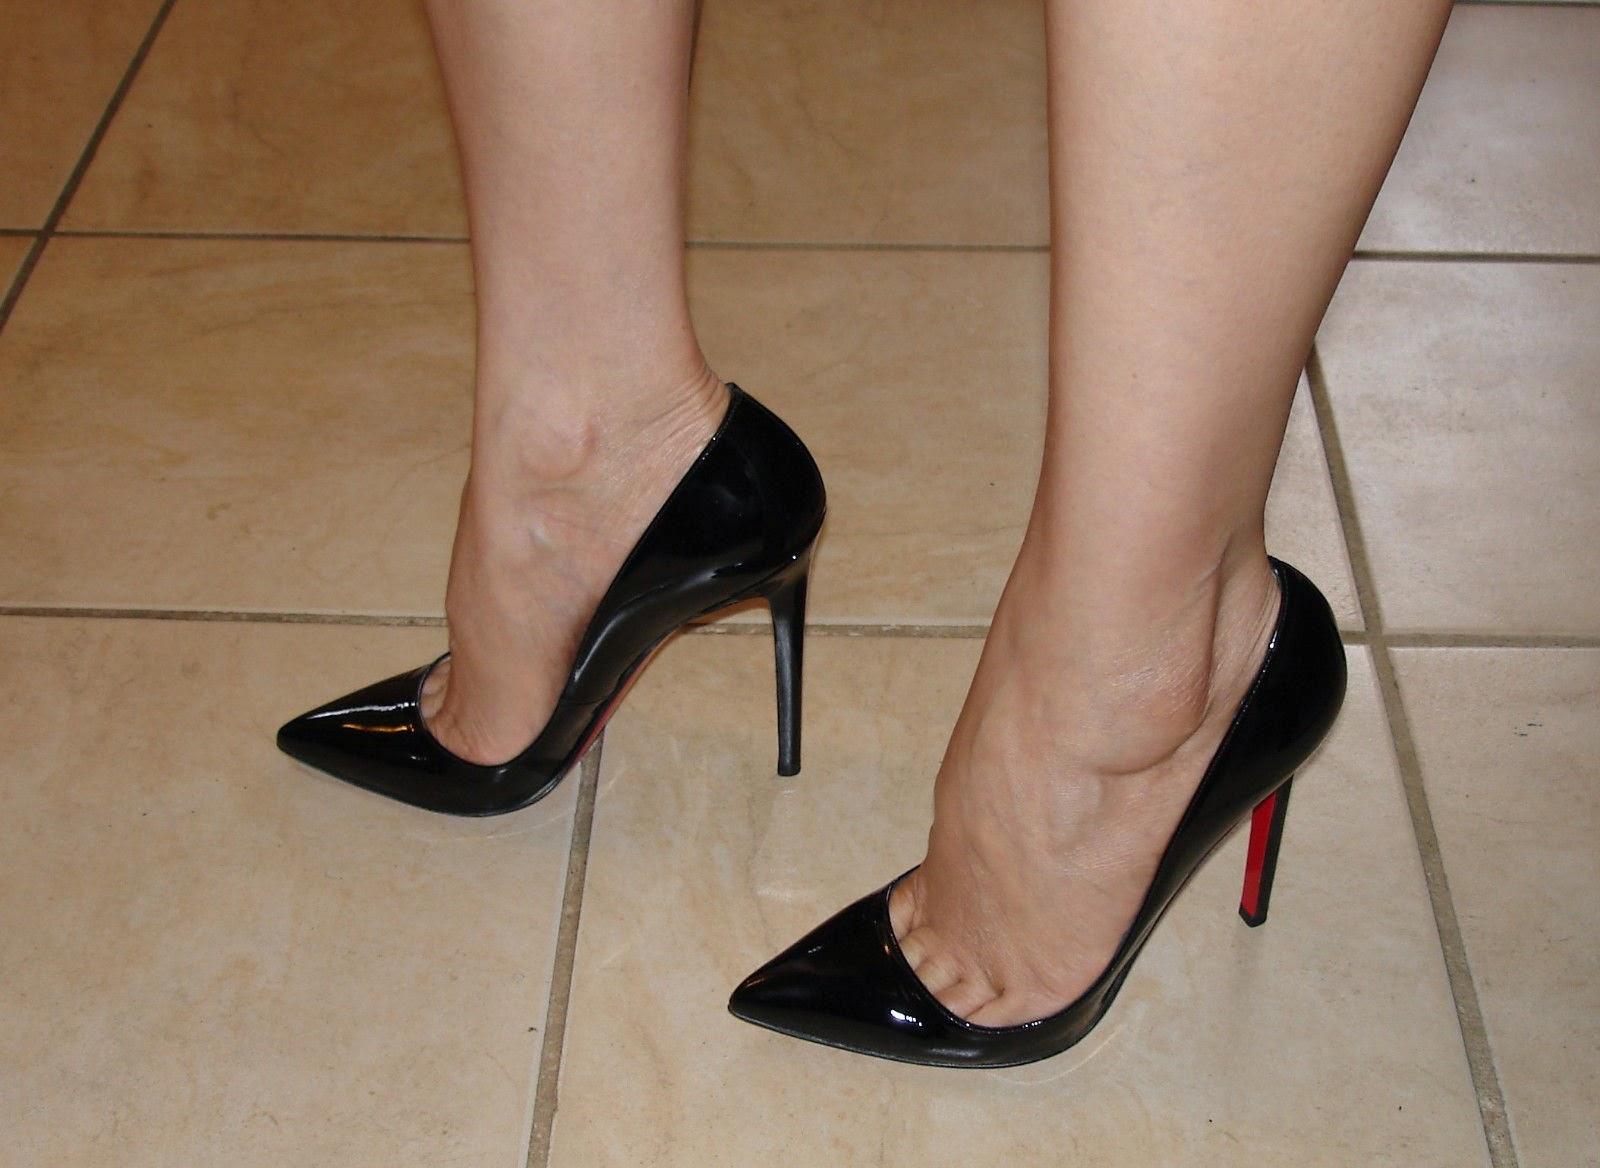 Nylon Toe Cleavage 50